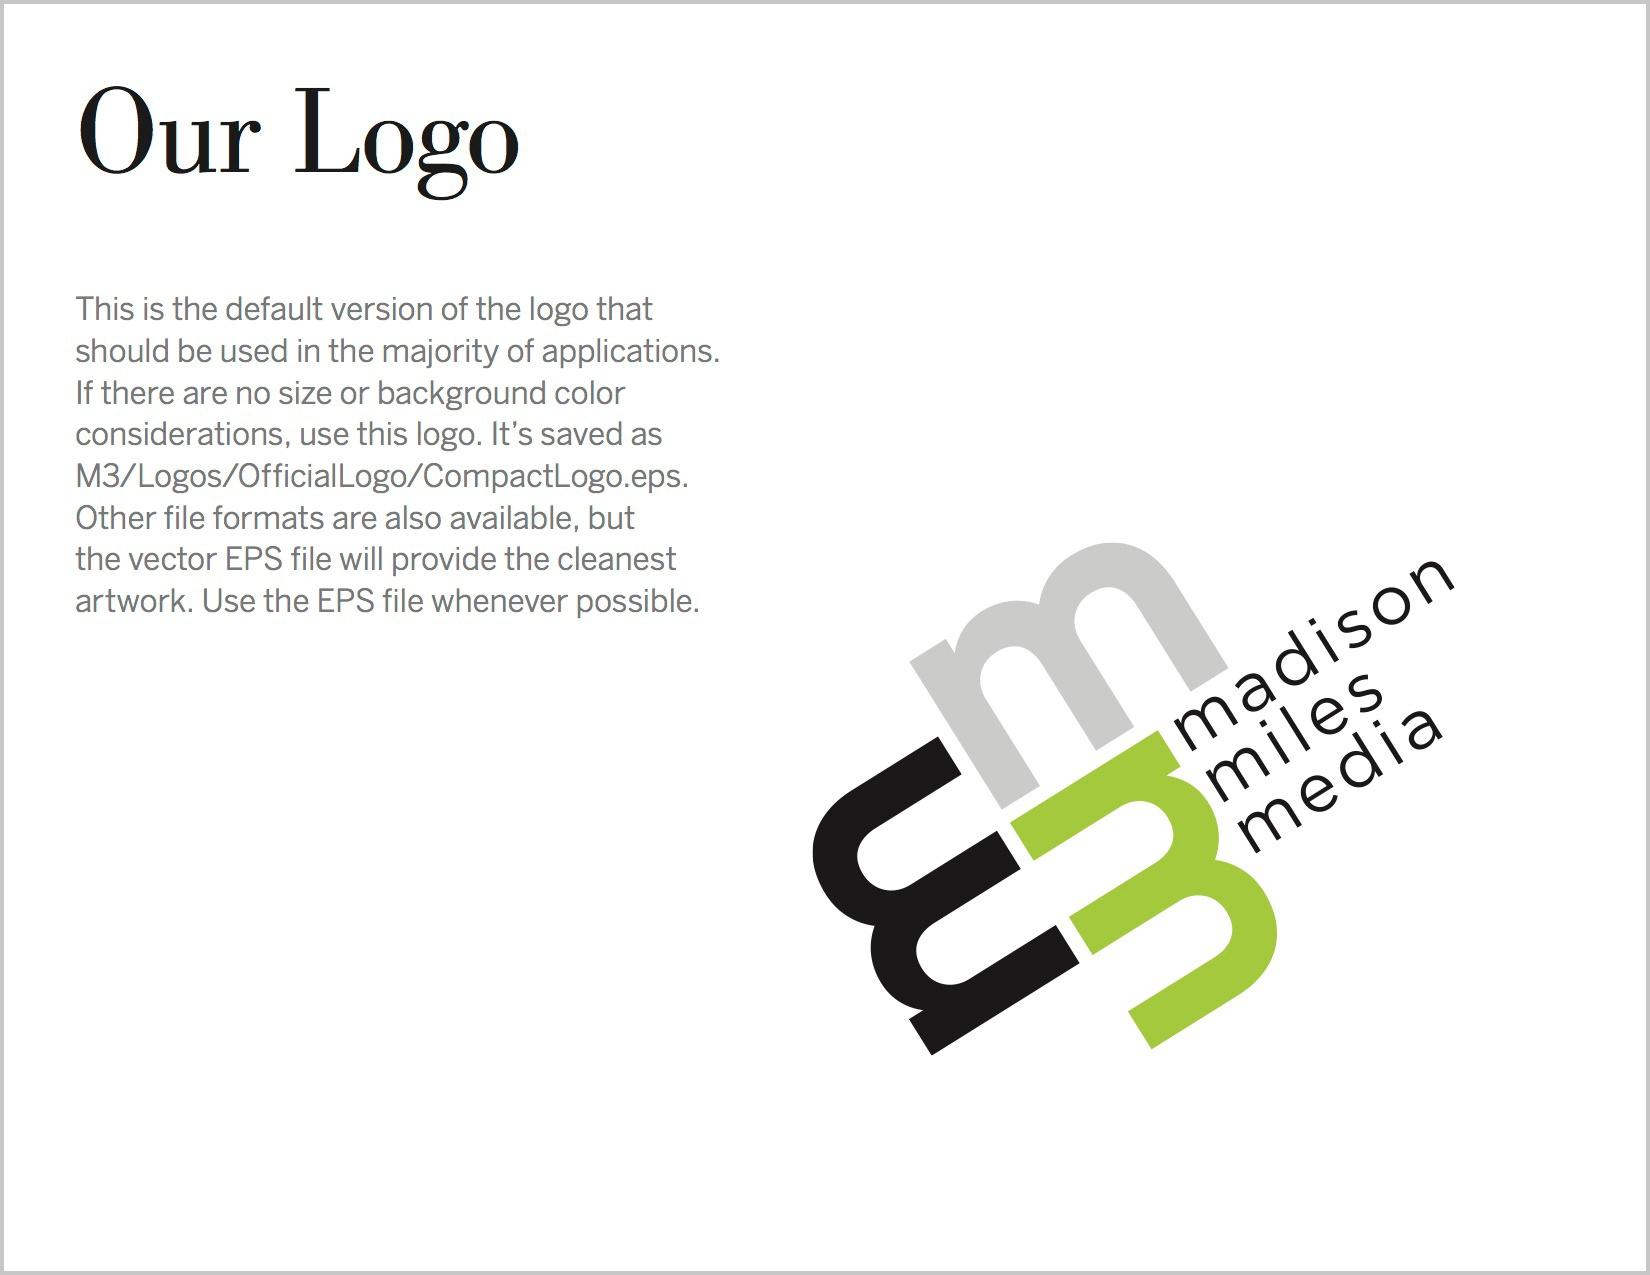 Defining the brand logo.